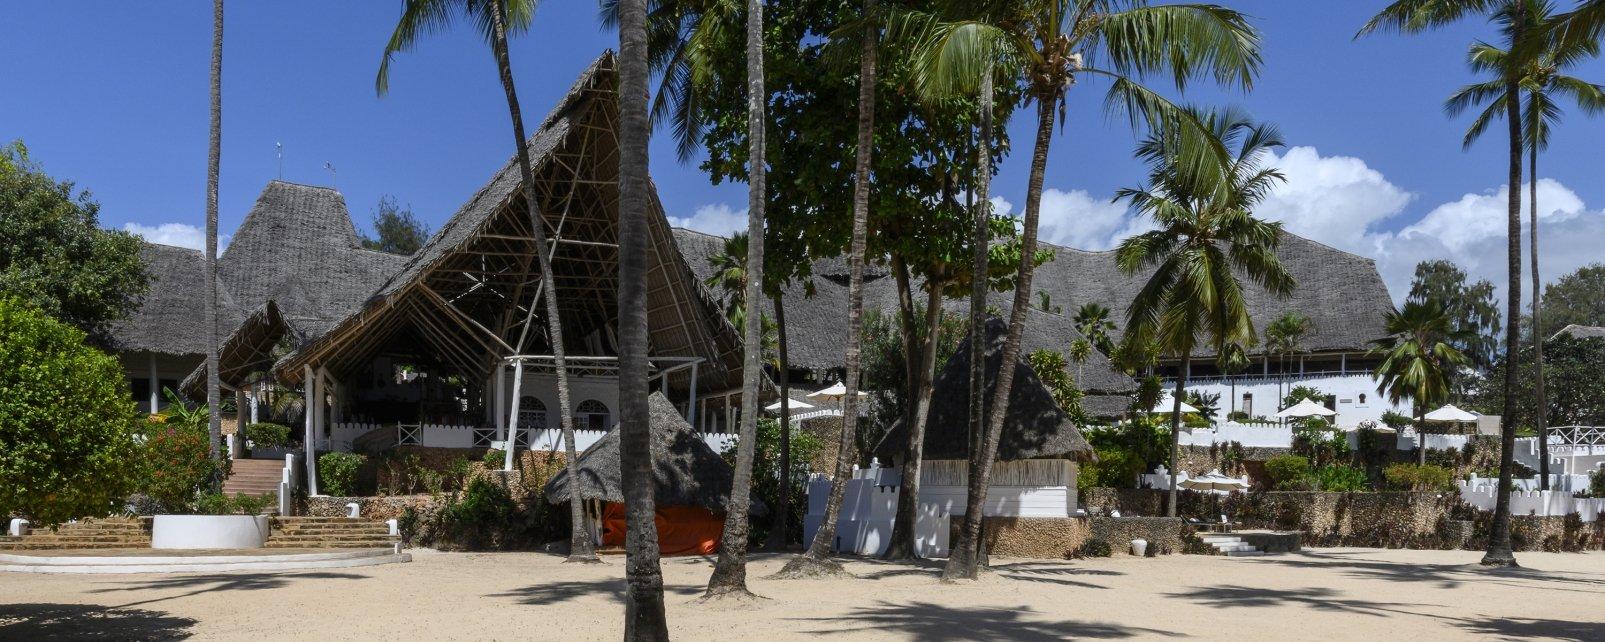 Hôtel Diamonds Mapenzi Beach Resort